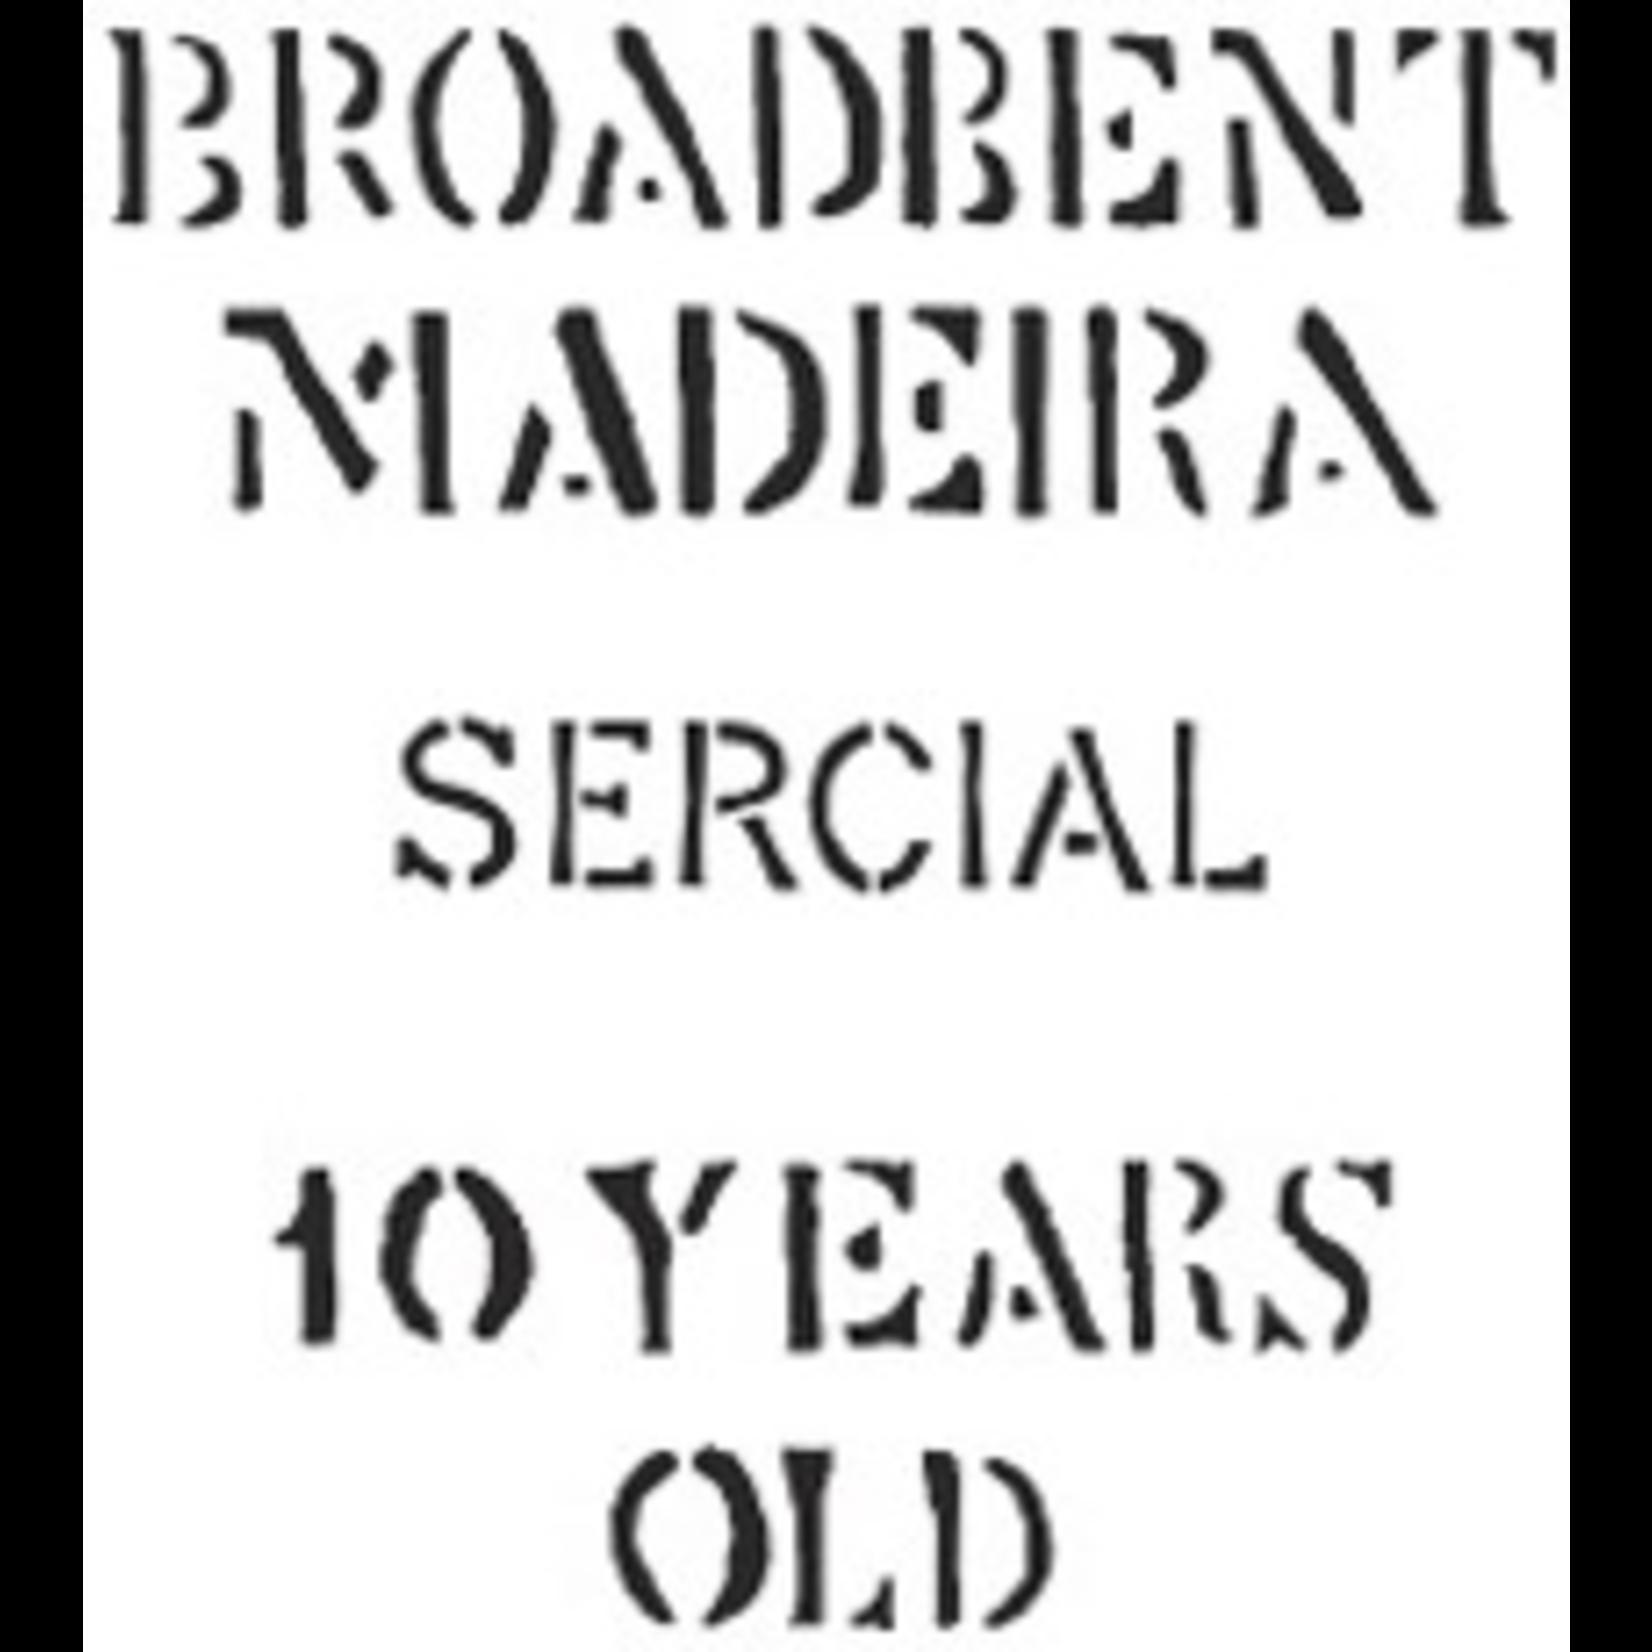 Wine Broadbent 10 Year Old Sercial Madeira